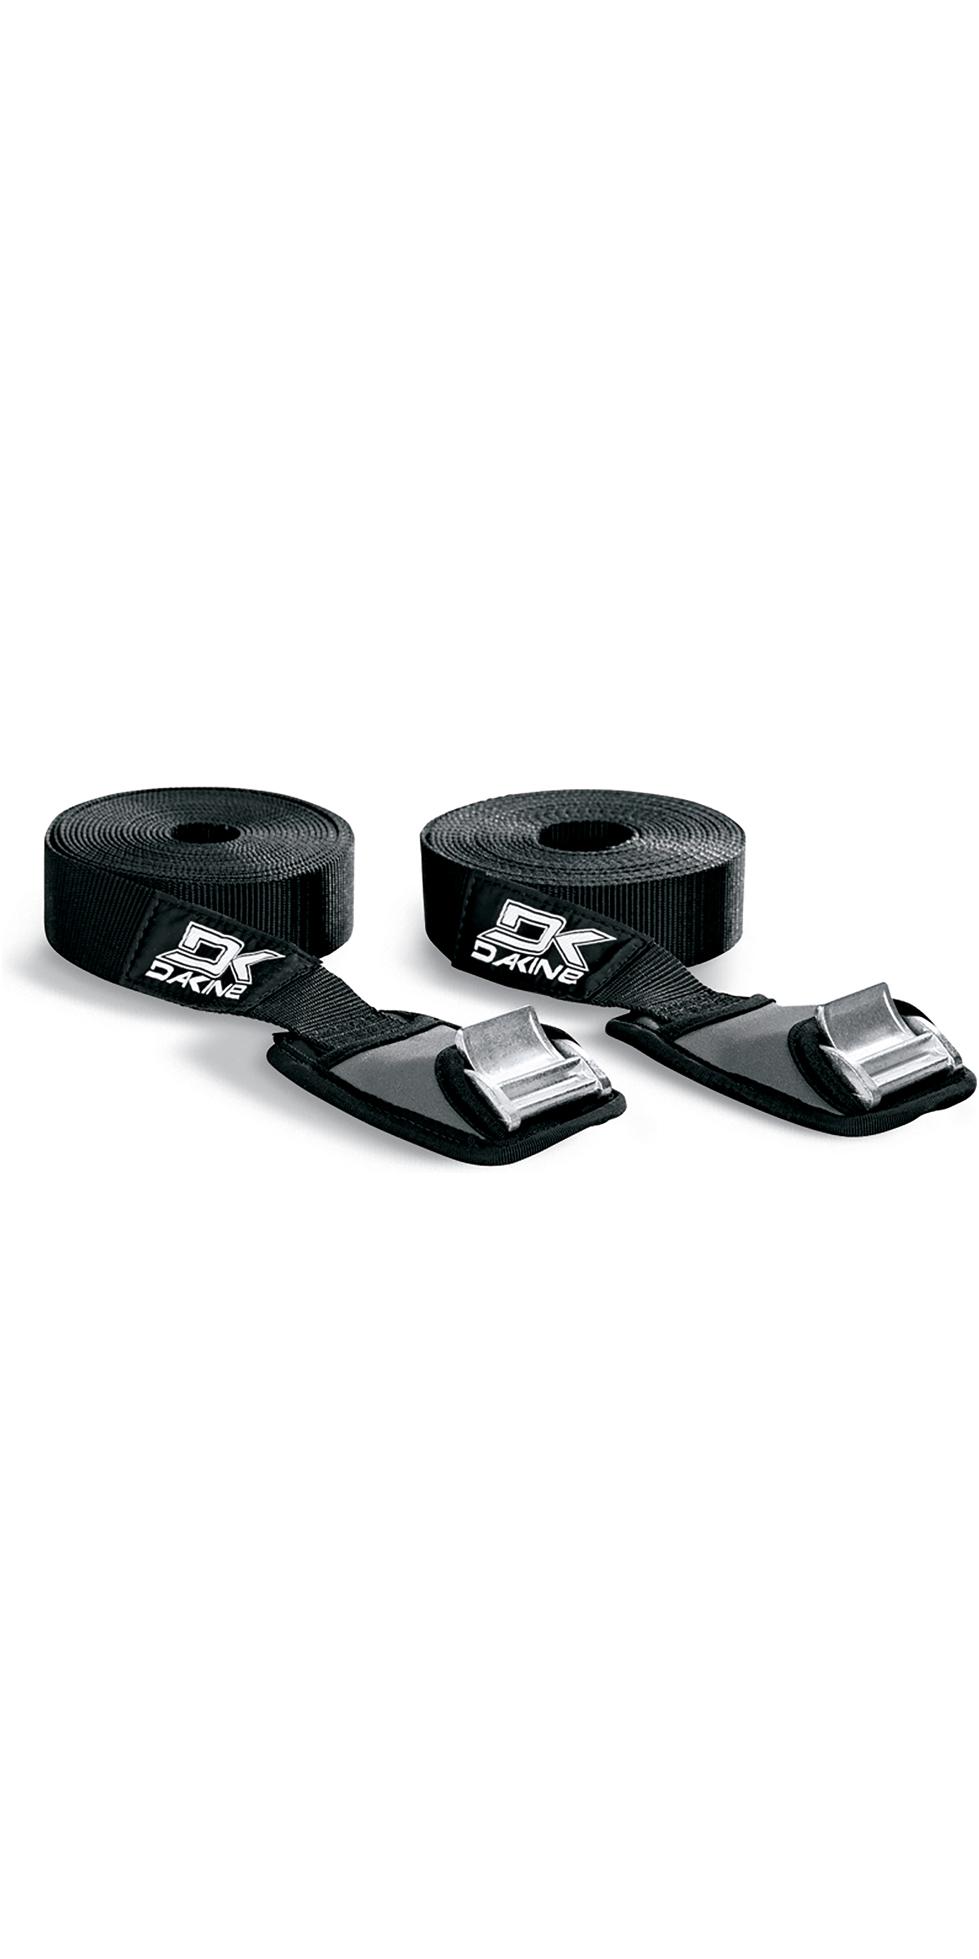 Dakine Baja 12' 3.6m Tie Down Straps BLACK 8840560